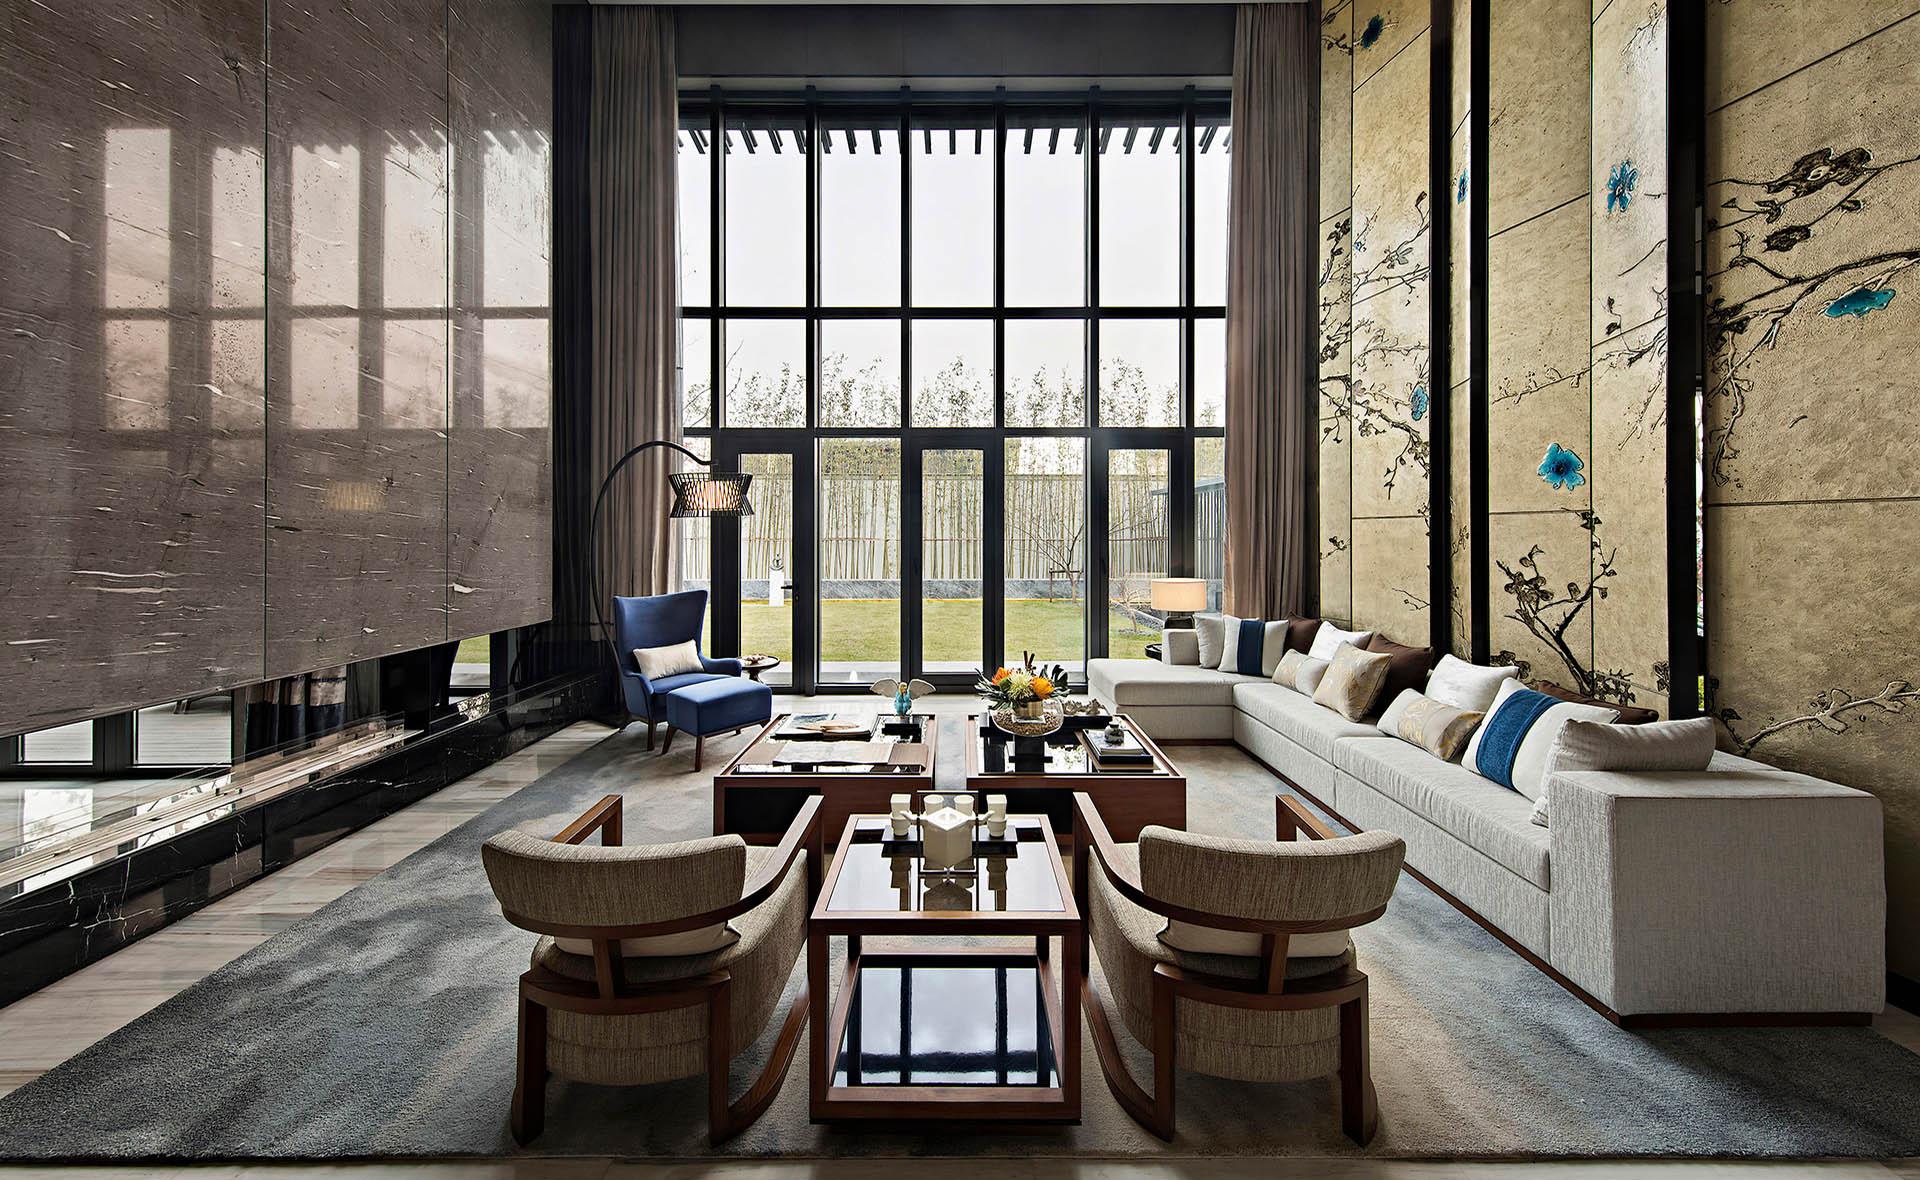 Hong Kong Interior Designers: Our Top 10 Modern Chairs hong kong interior designers Hong Kong Interior Designers: Our Top 10 Modern Chairs Hong Kong Interior Designers Our Top 10 Modern Chairs 9